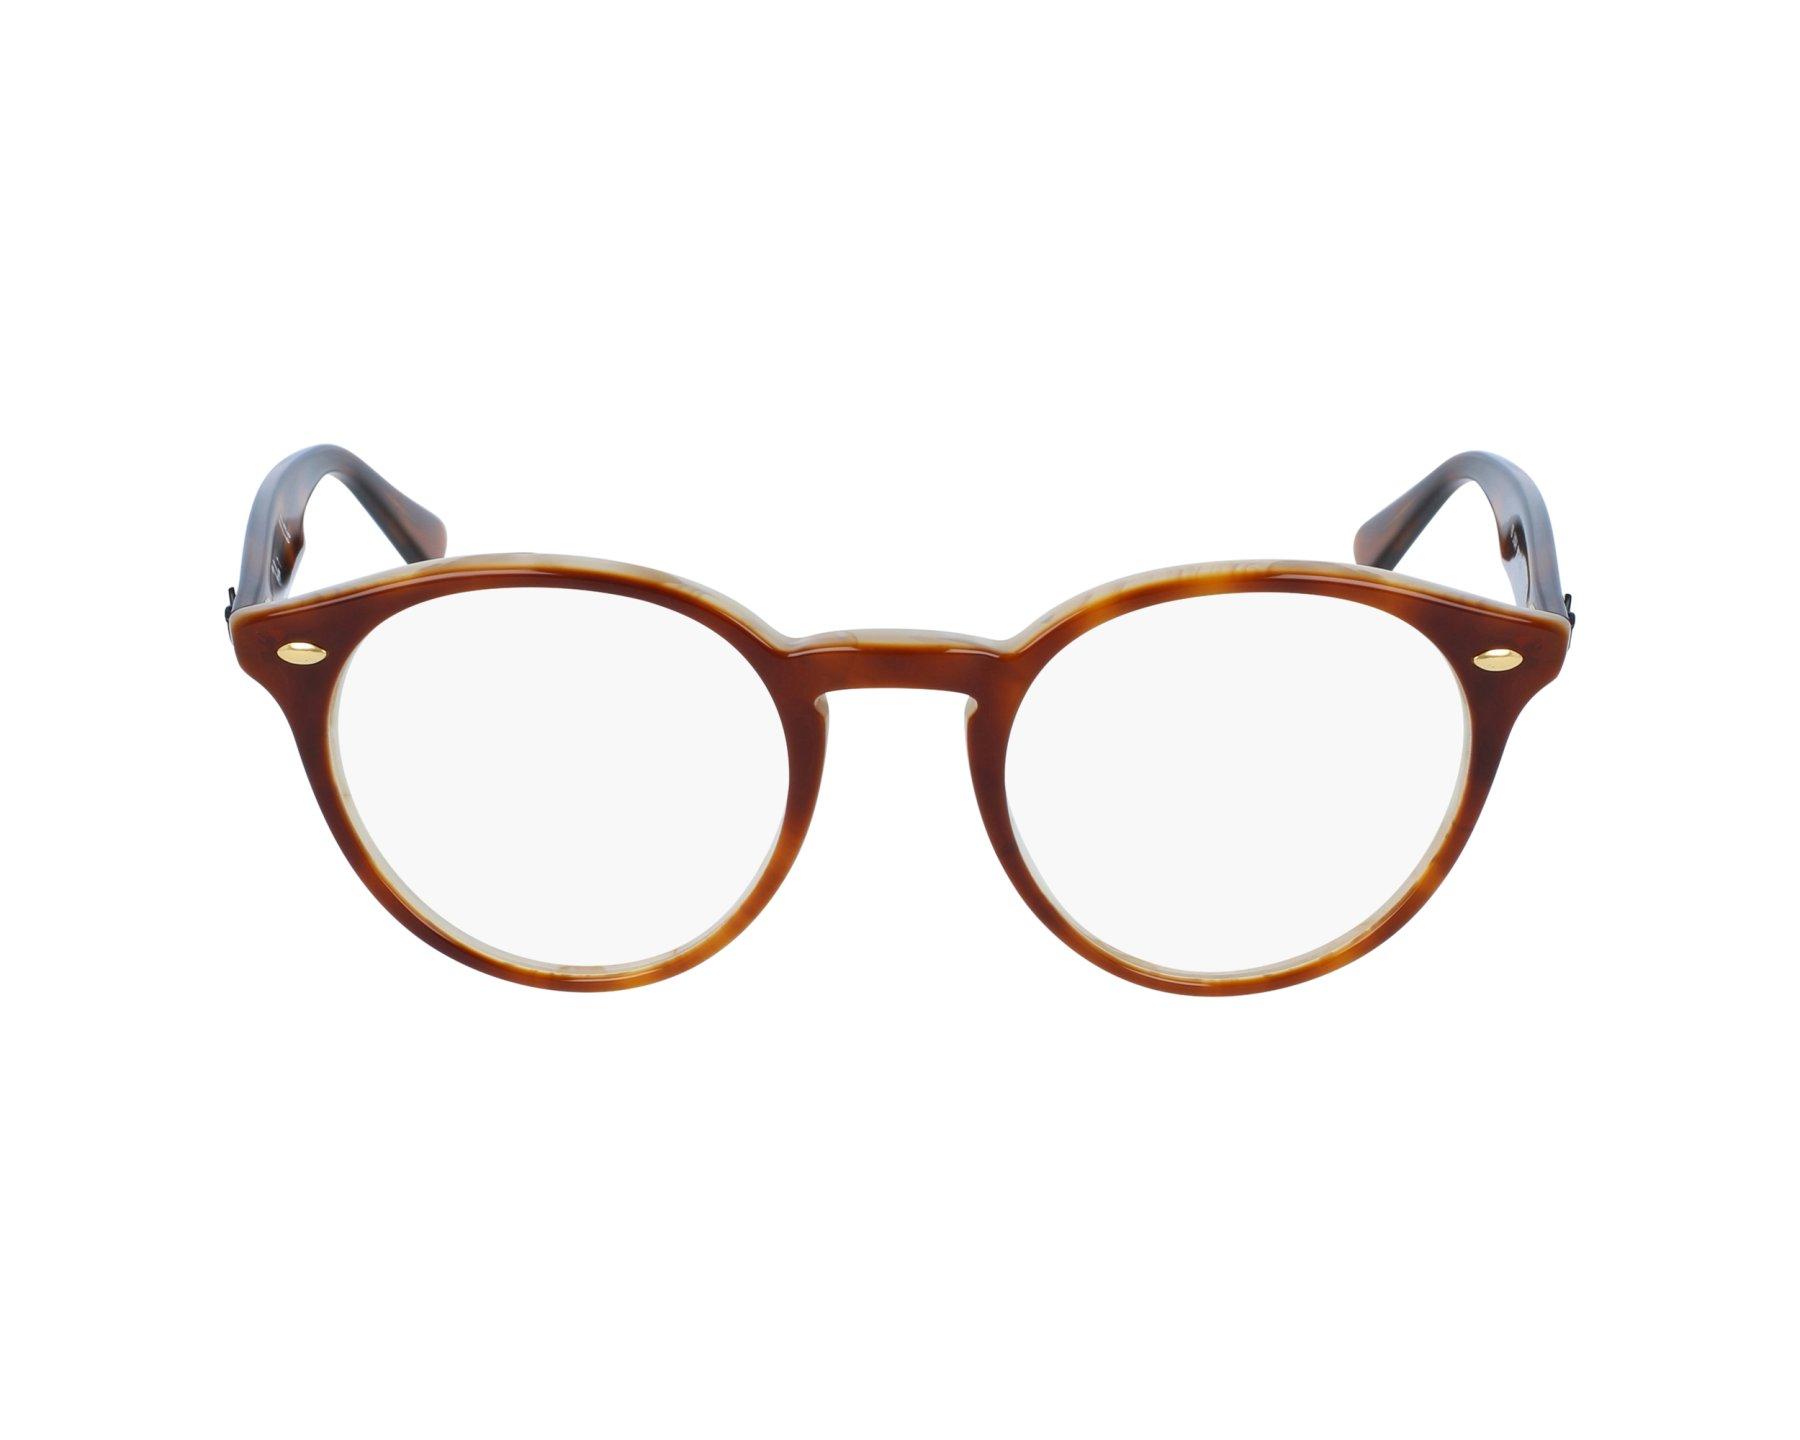 10c01ae68e256 Gafas Graduadas Ray-Ban RX-2180-V 5677 47-21 Marrón Havana